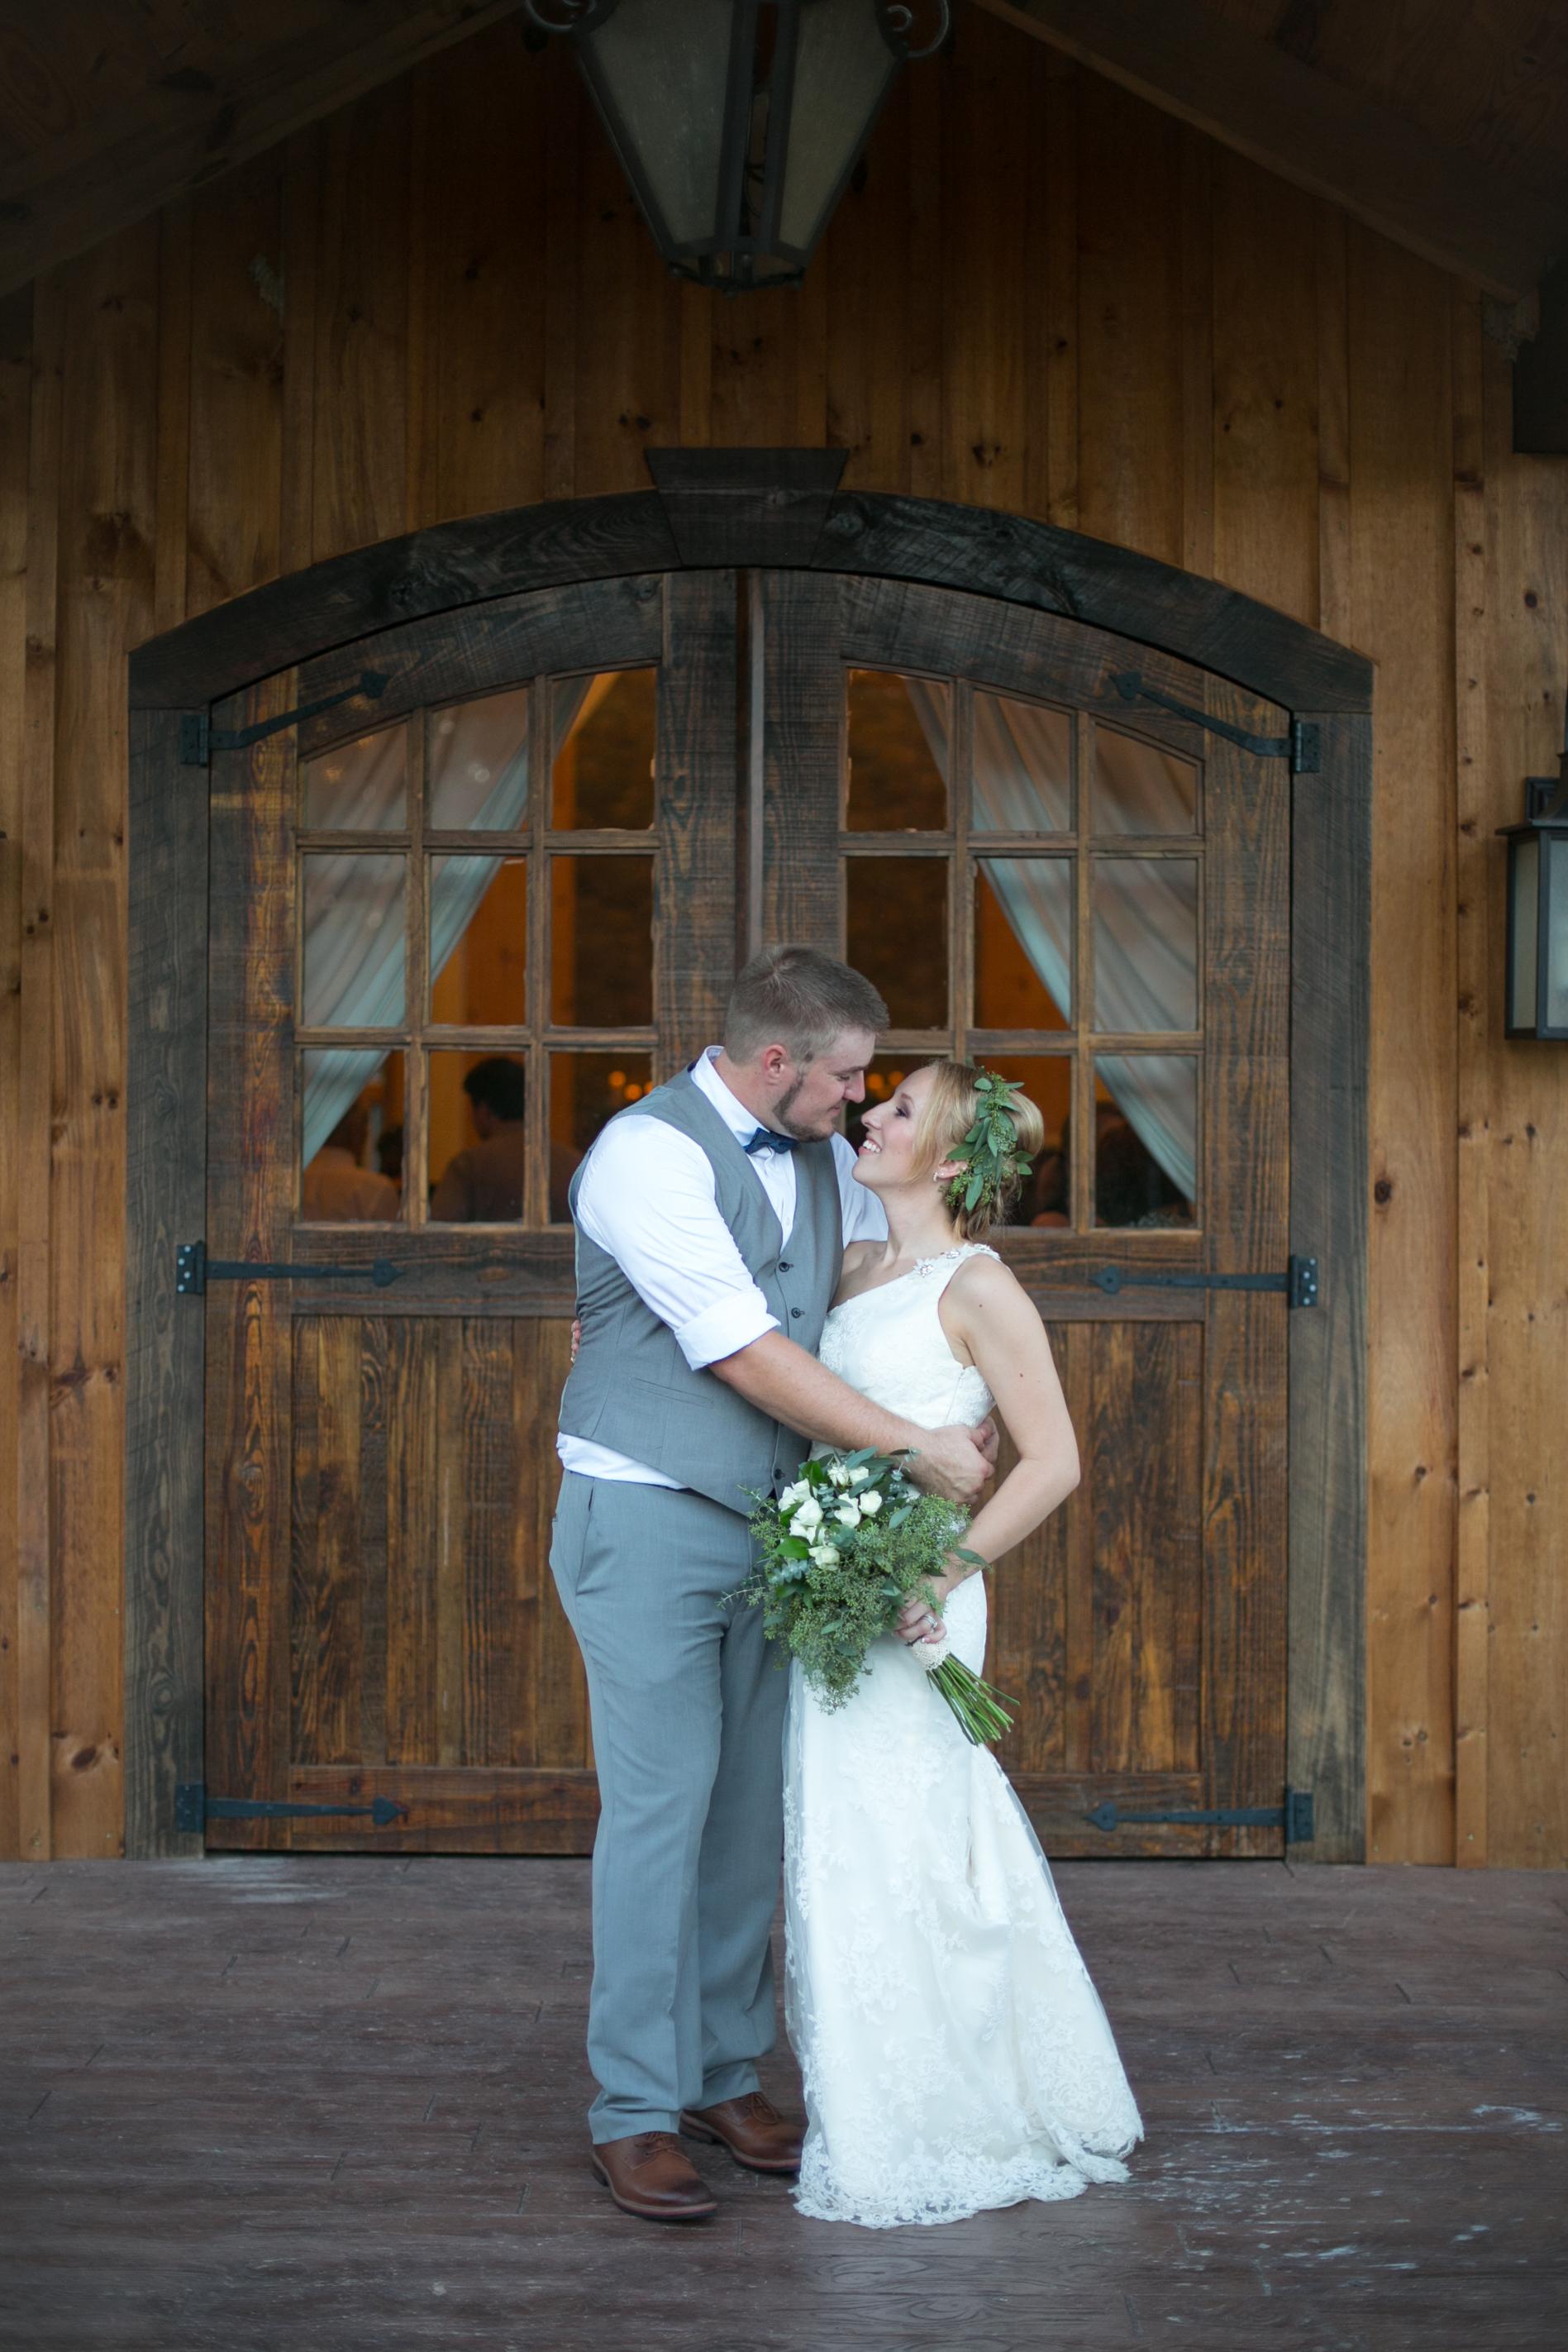 Luke_Sarah_Calaway_Wedding_12Aug17_1035.jpg